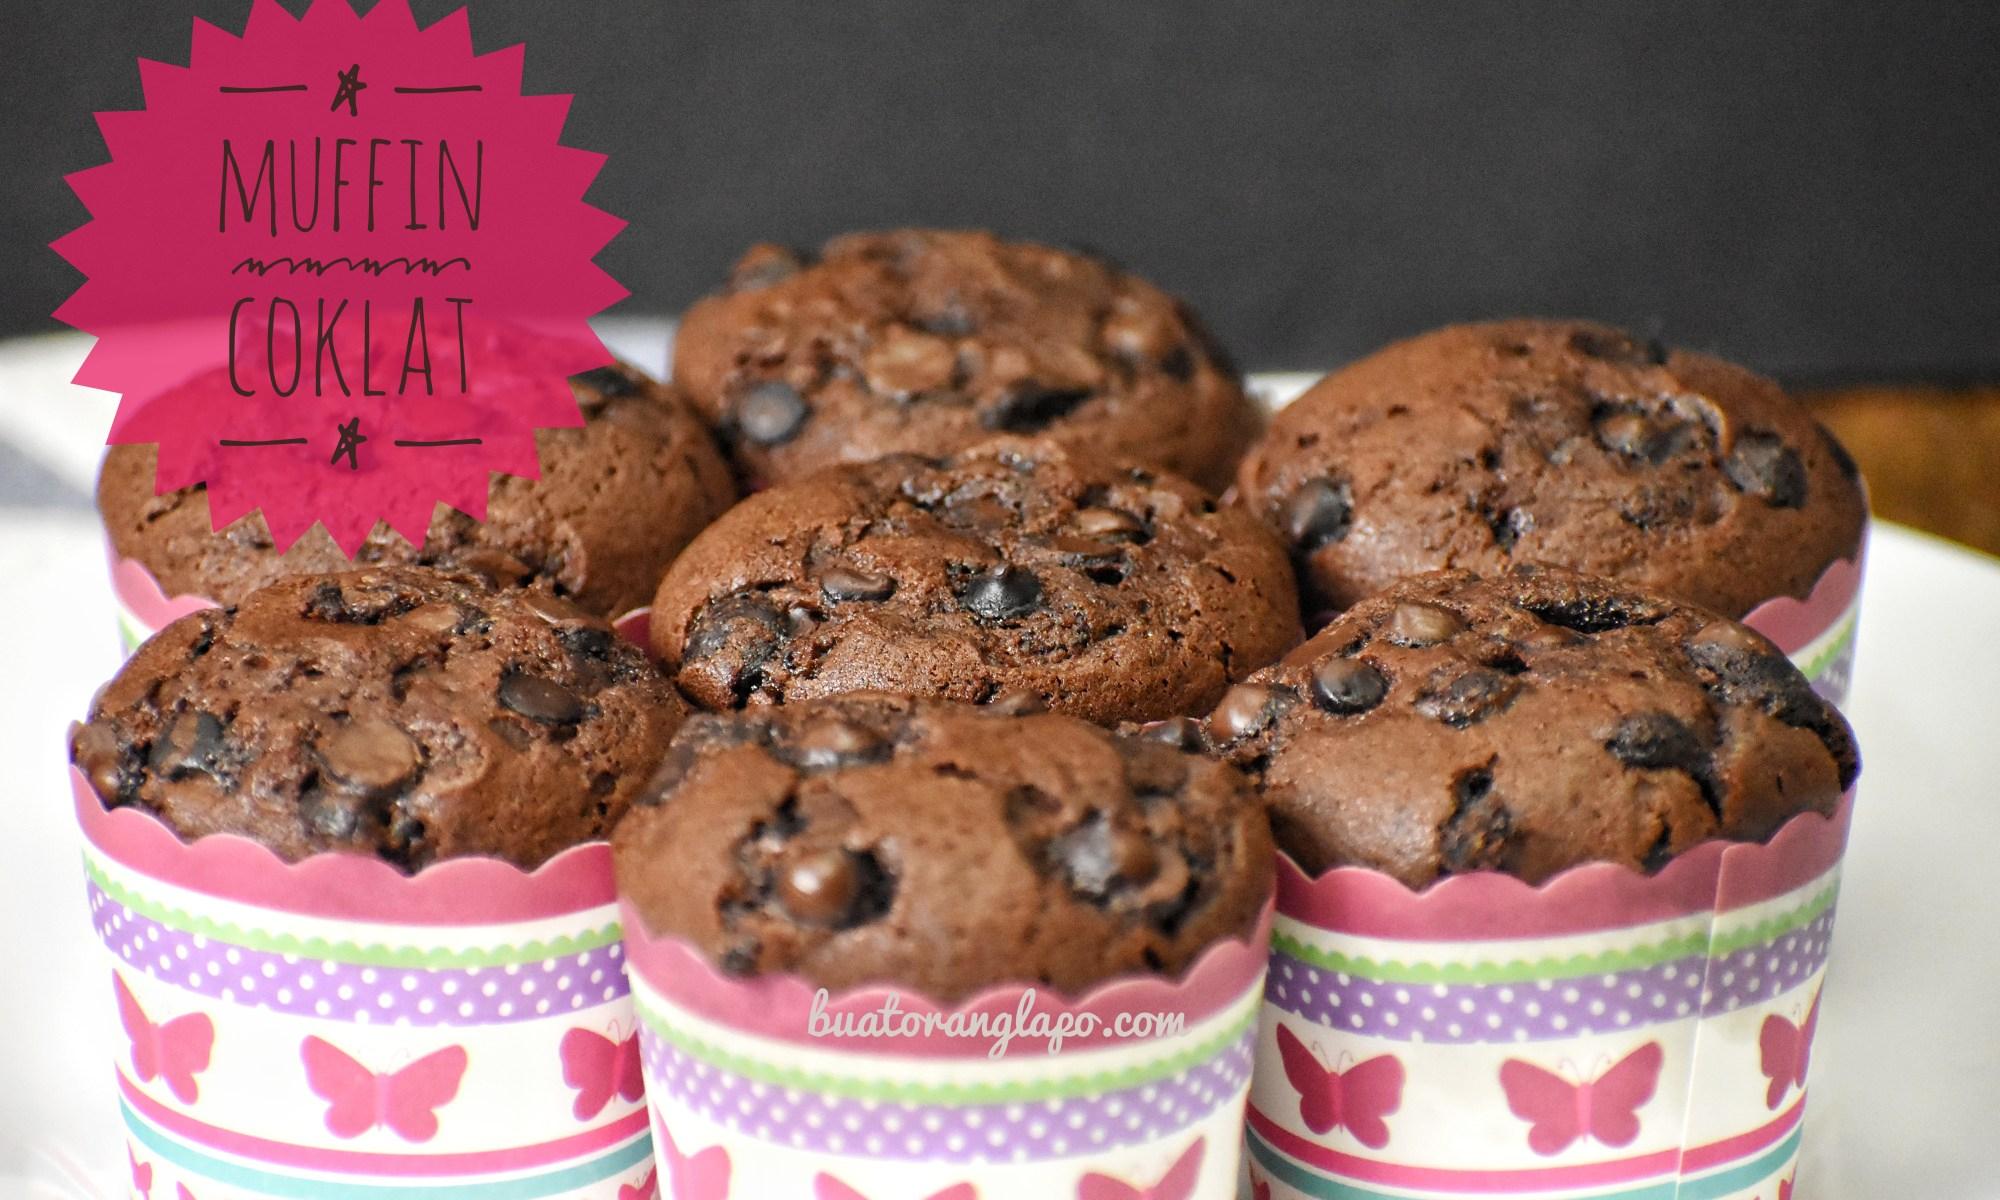 Muffin Coklat Yang Sangat Mudah Super Easy Chocolate Muffin